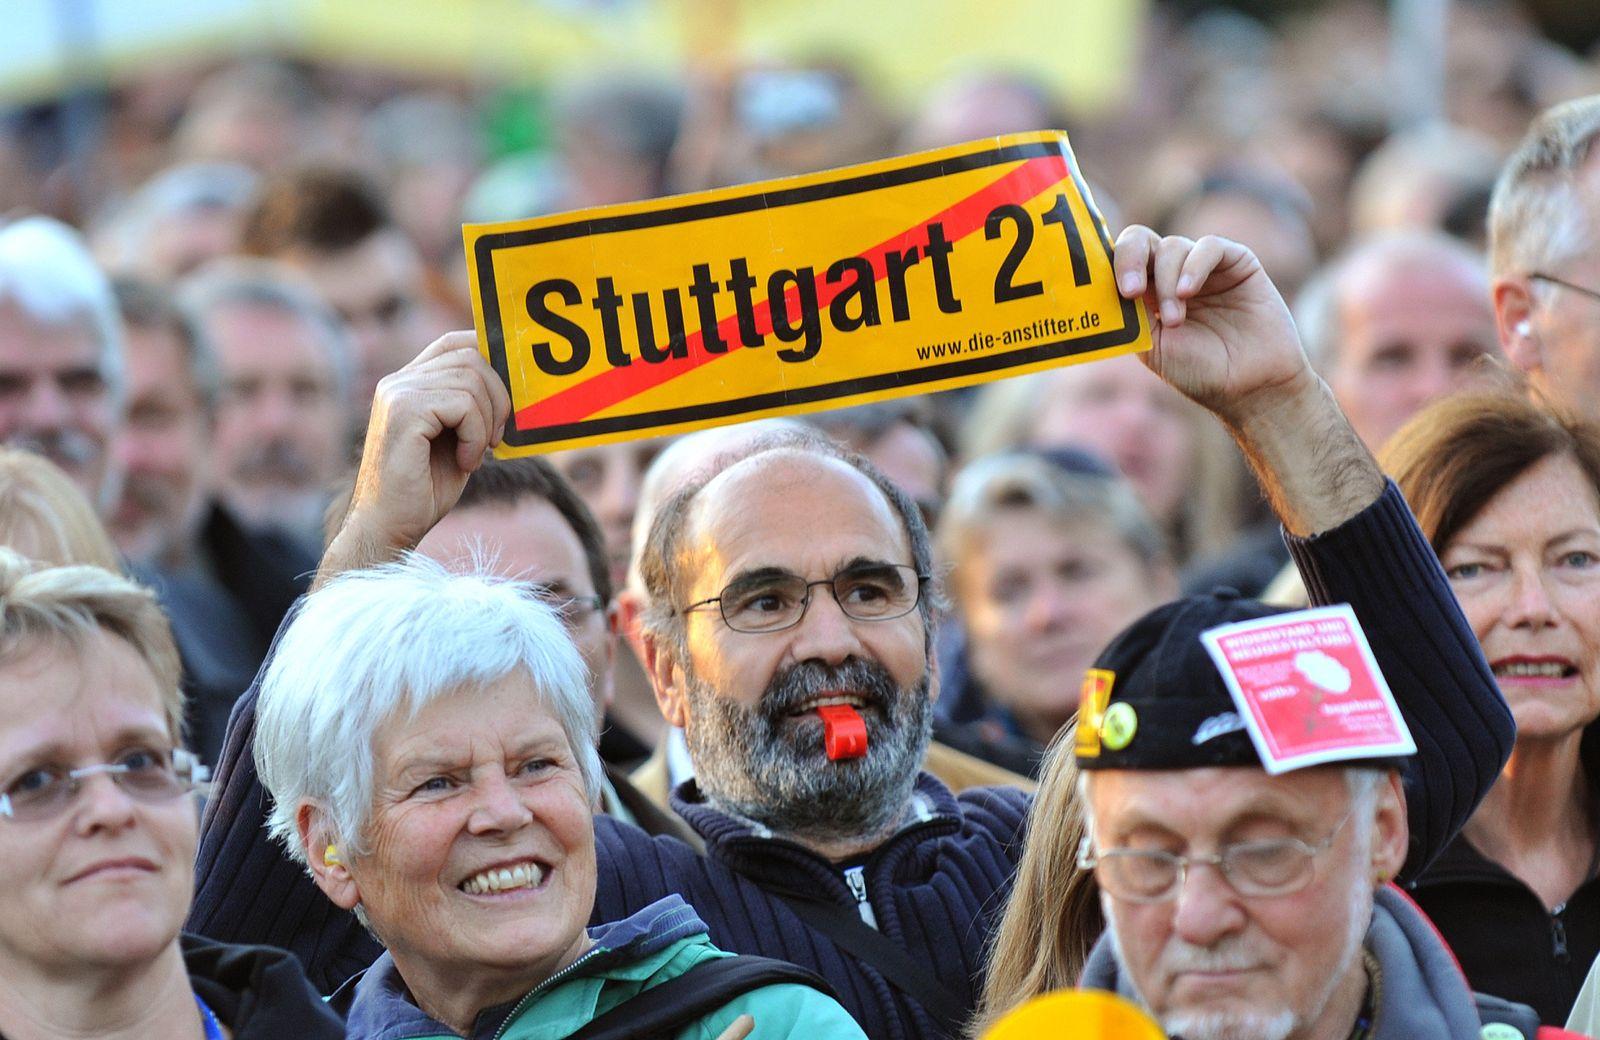 Stuttgart 21 / Demo / Alte